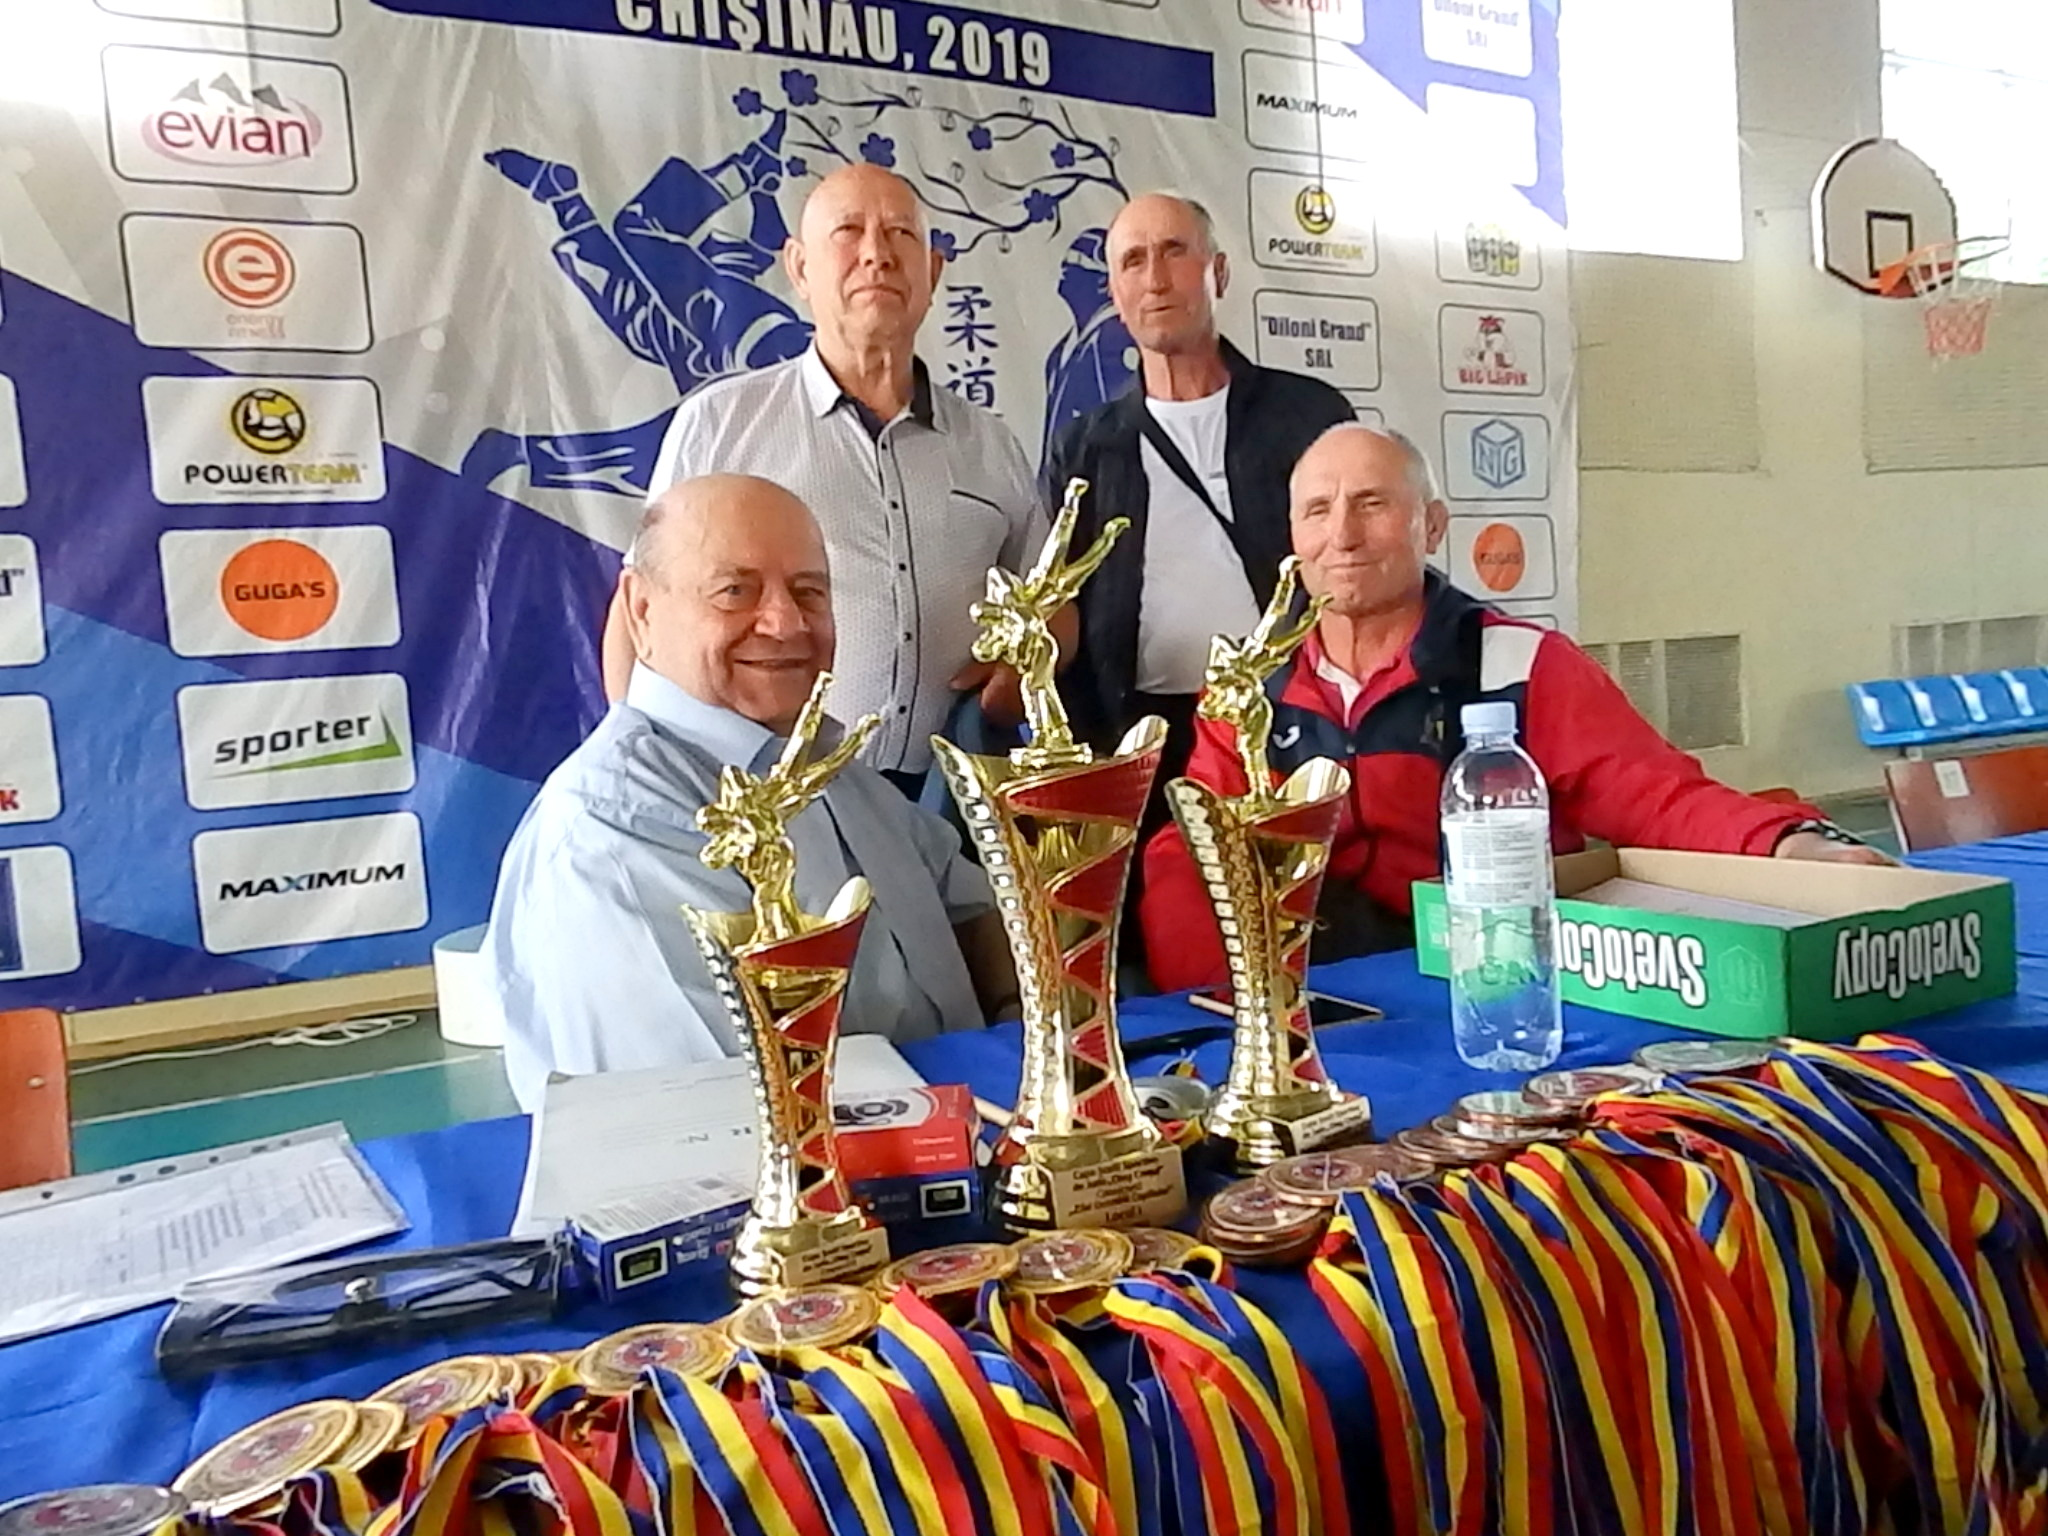 Judo.MD 2019 * Cupa Oleg Cretul (01.06.2019)